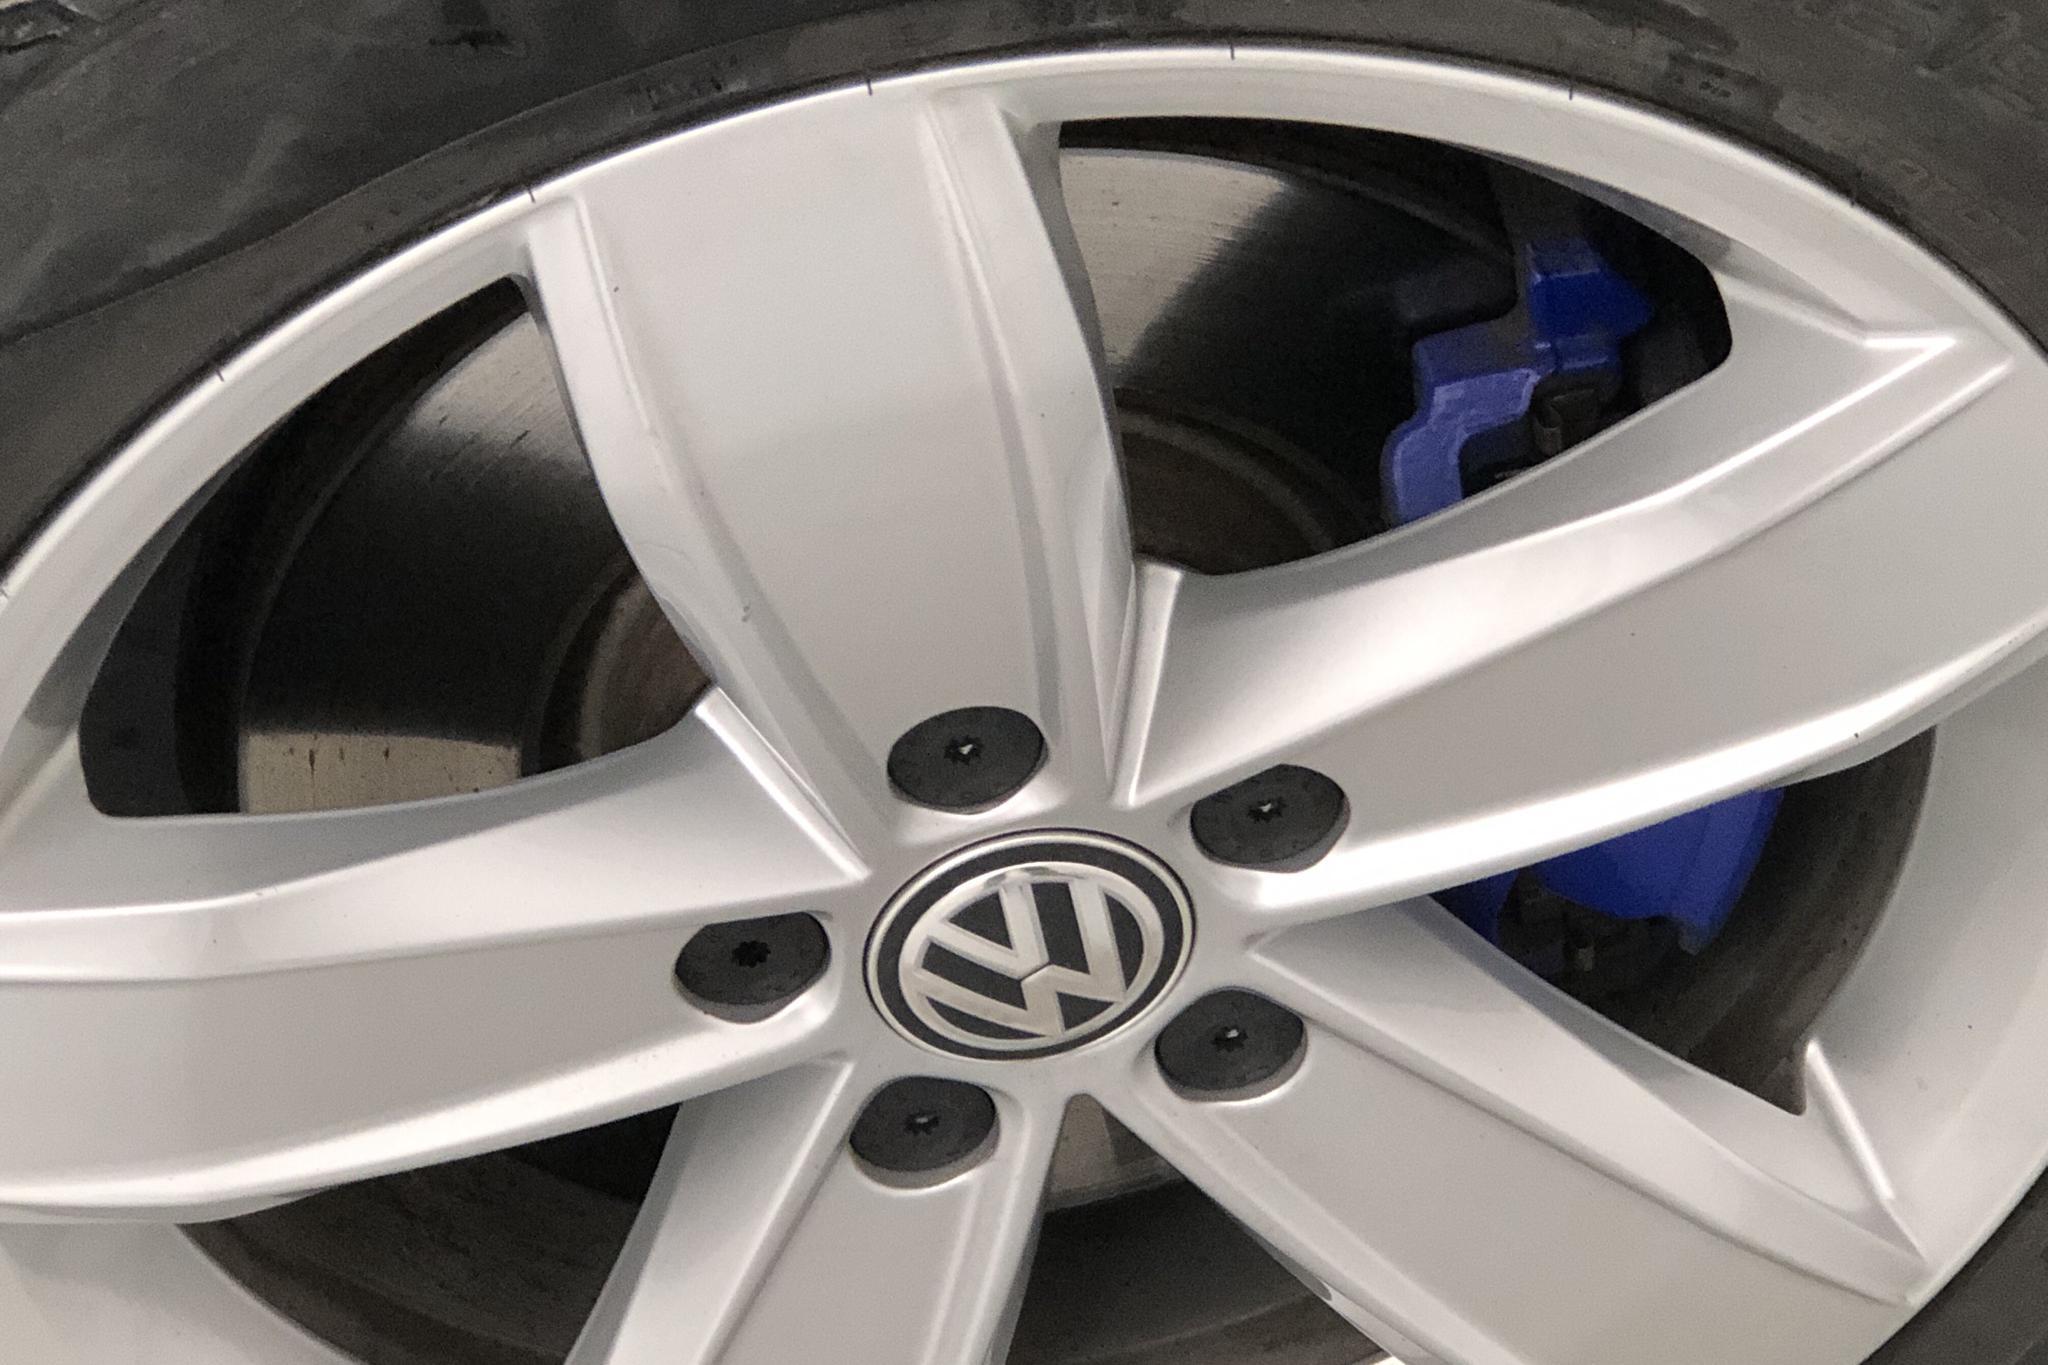 VW Passat 1.4 Plug-in-Hybrid Sportscombi (218hk) - 63 050 km - Automatic - Dark Grey - 2018